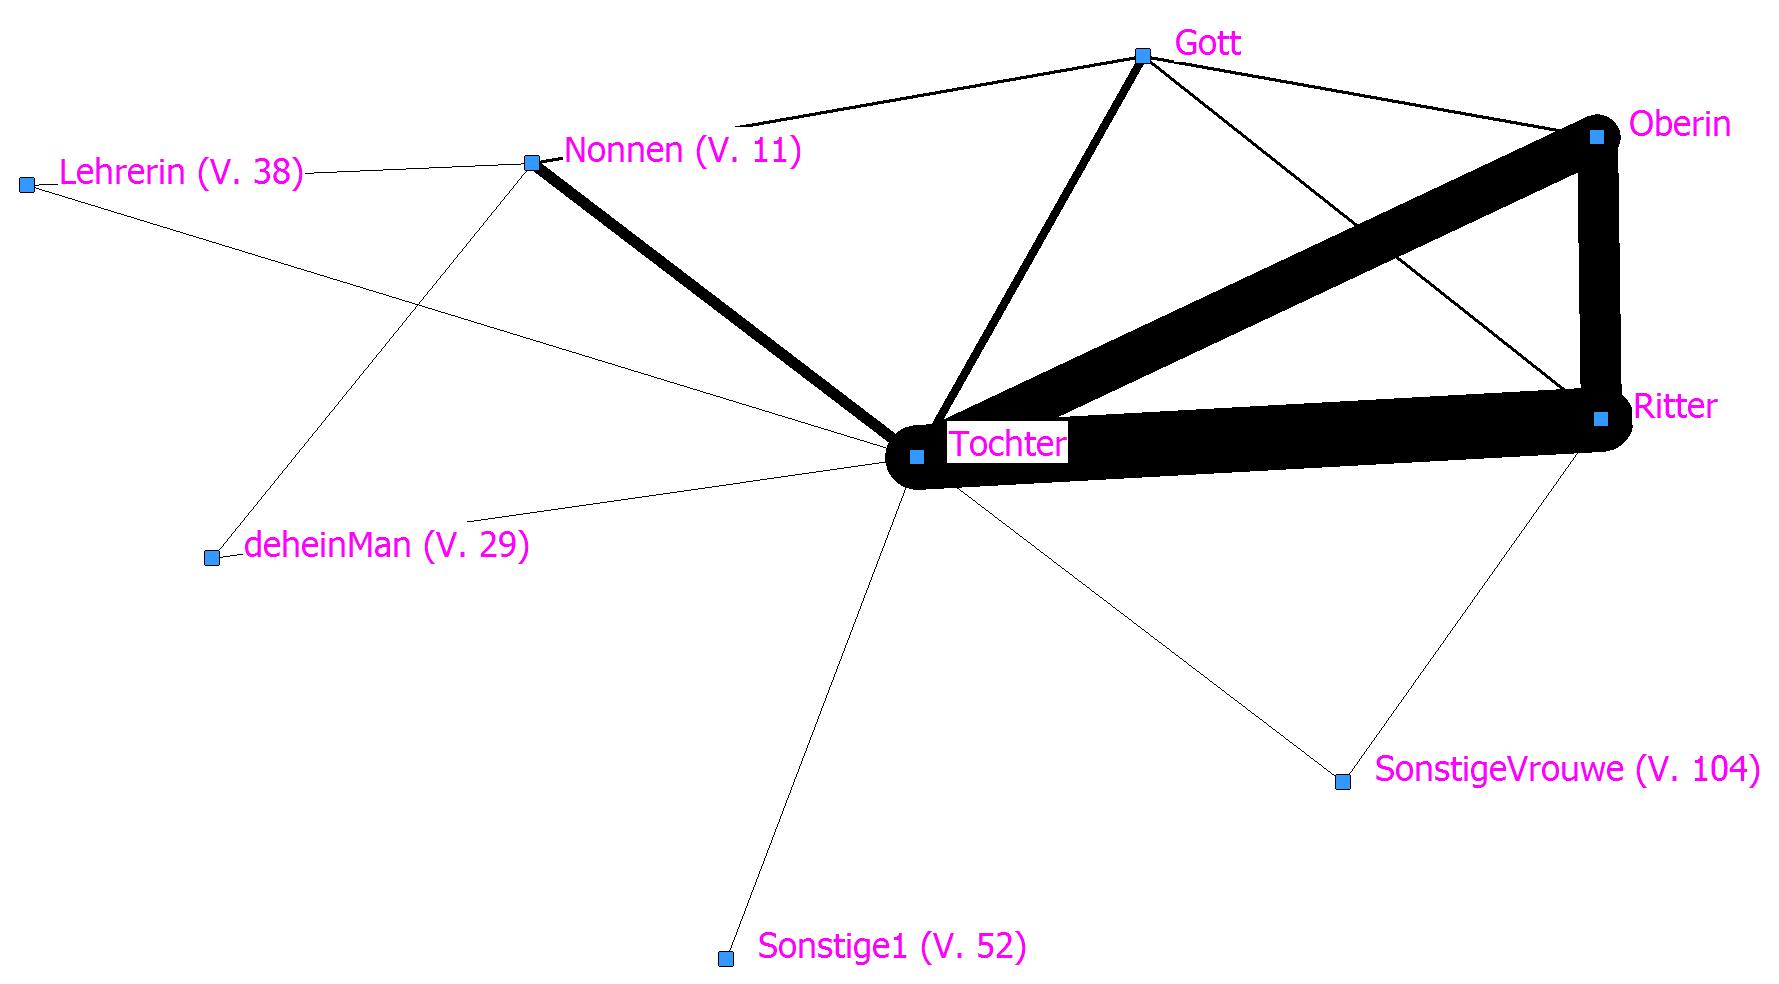 Abb. 17: SNA-Plot zum Sperber auf Basis von <FigurenBezug>. [Grafik: Dimpel 2016.]